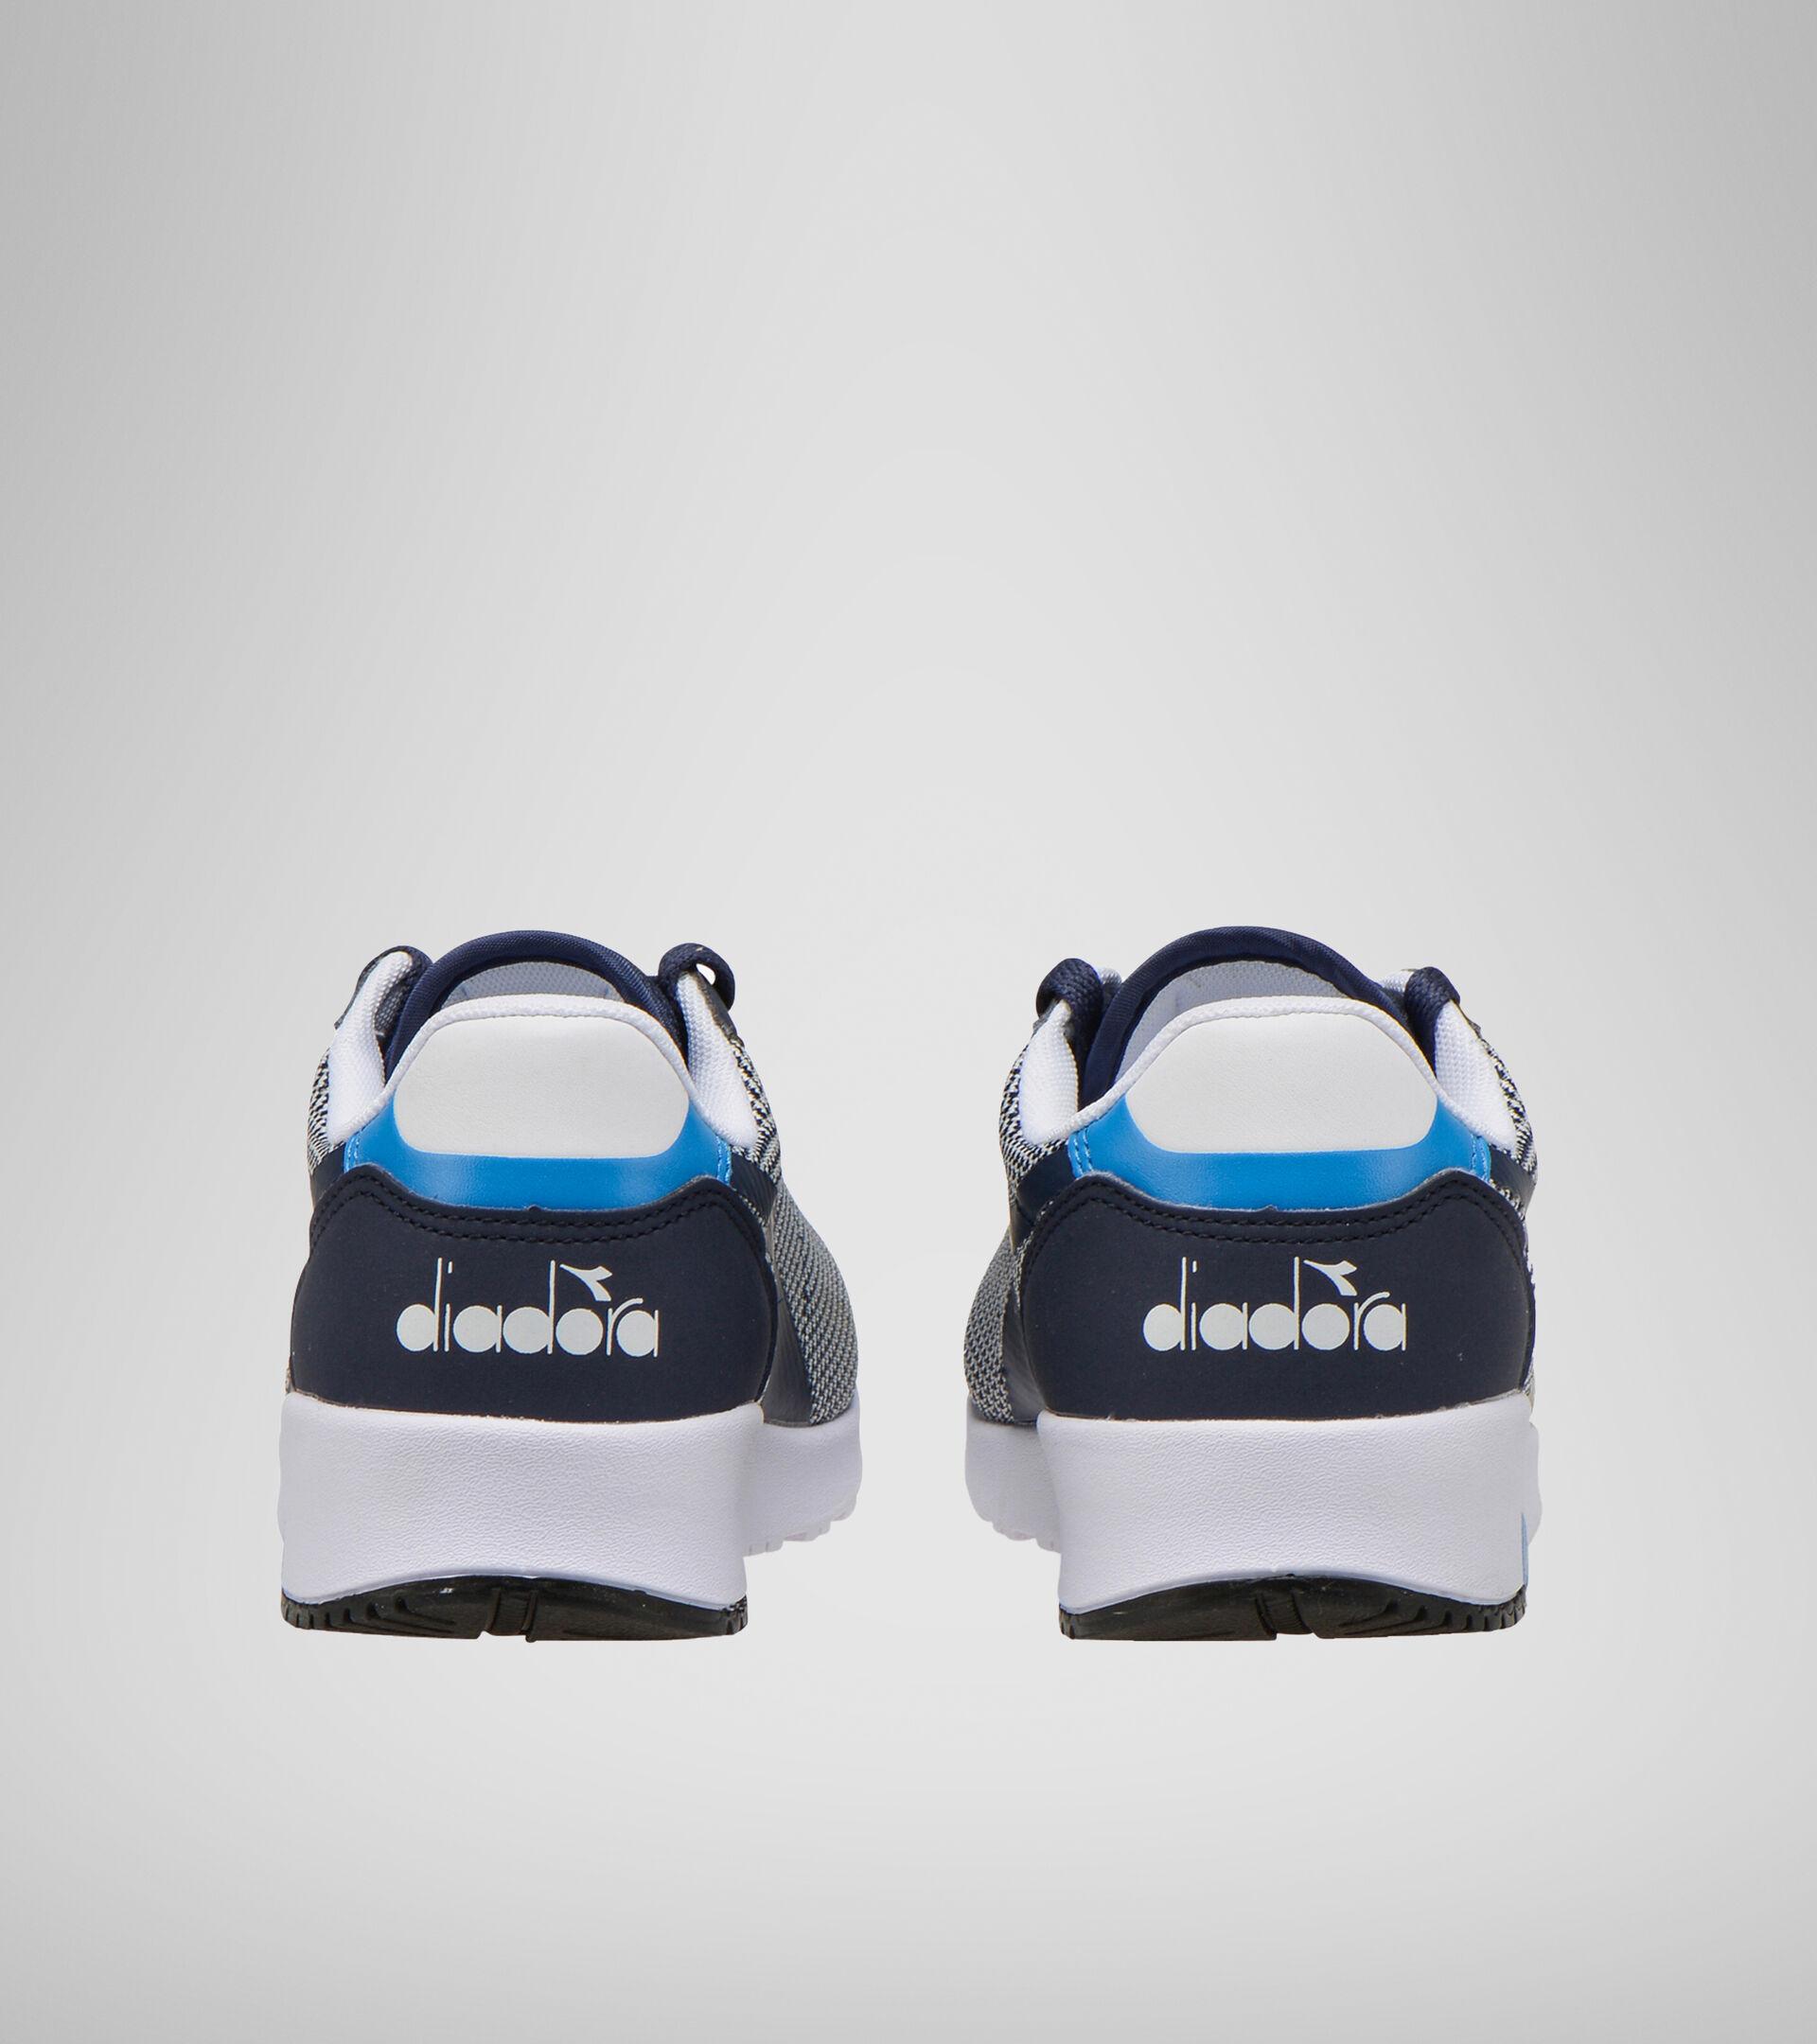 Footwear Sport BAMBINO EVO RUN GS BLU CORSARO/AZZURRO ALLEGRO Diadora